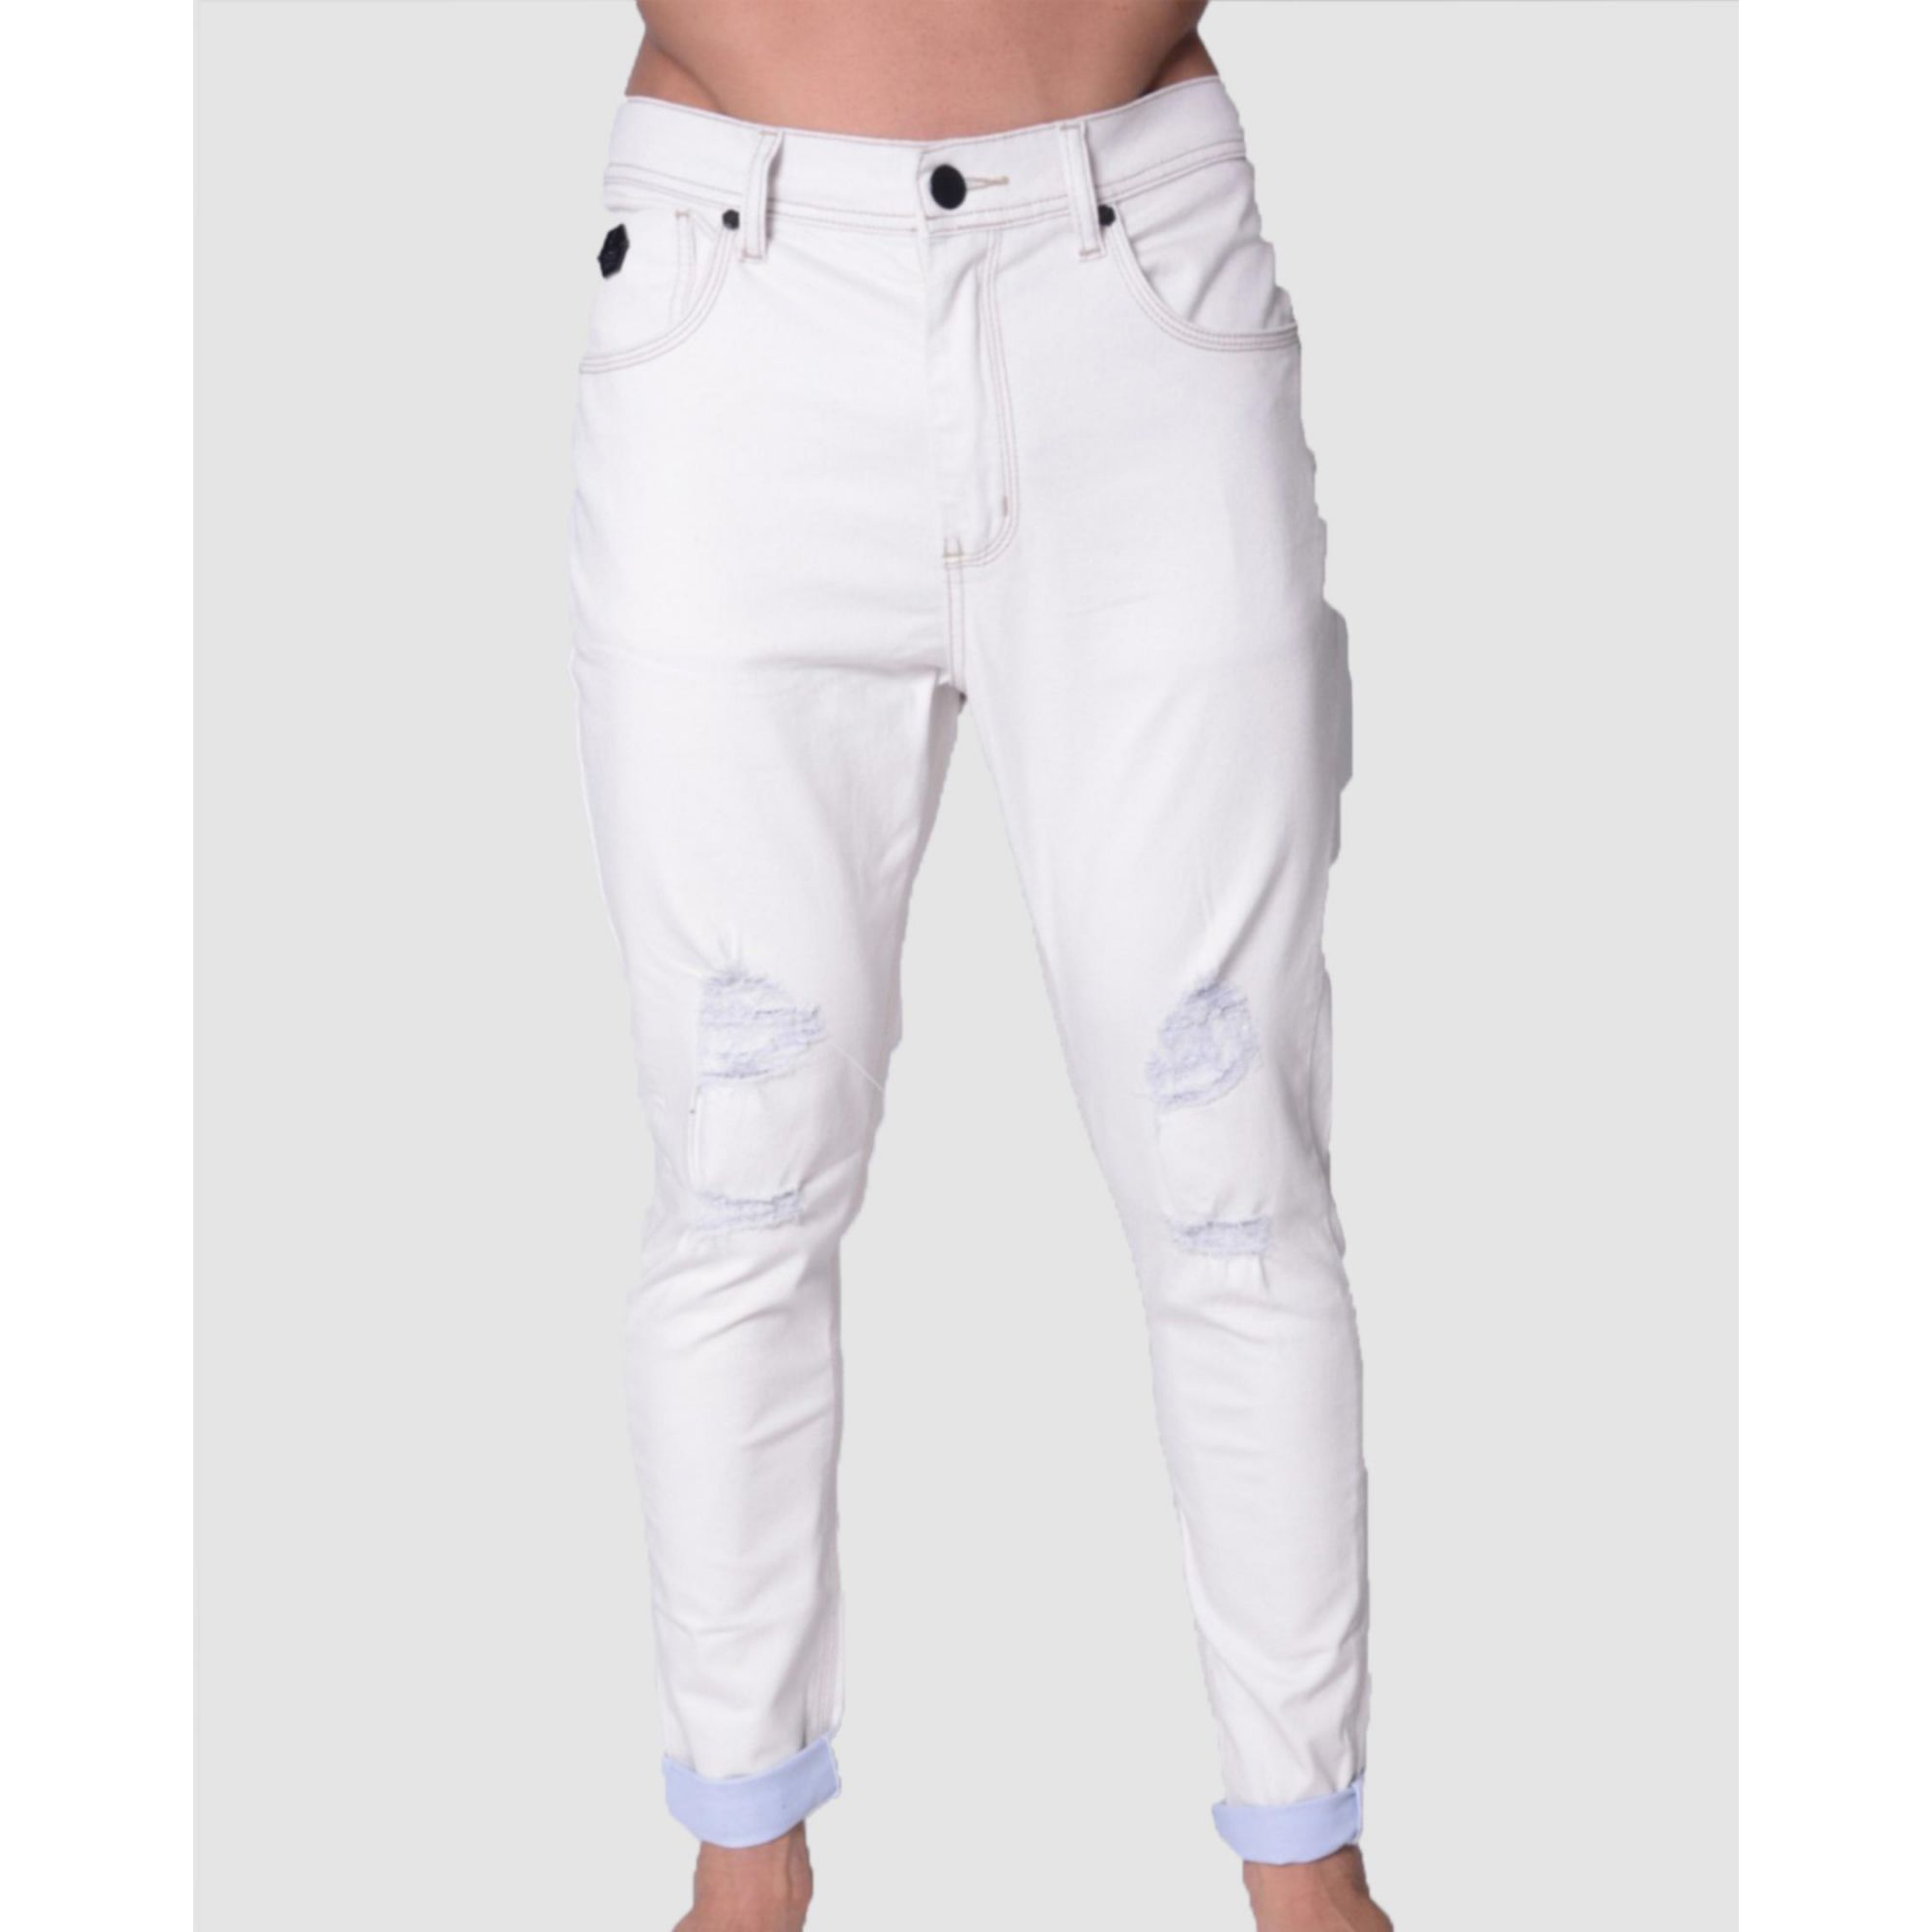 Calça Buh Jeans White & White